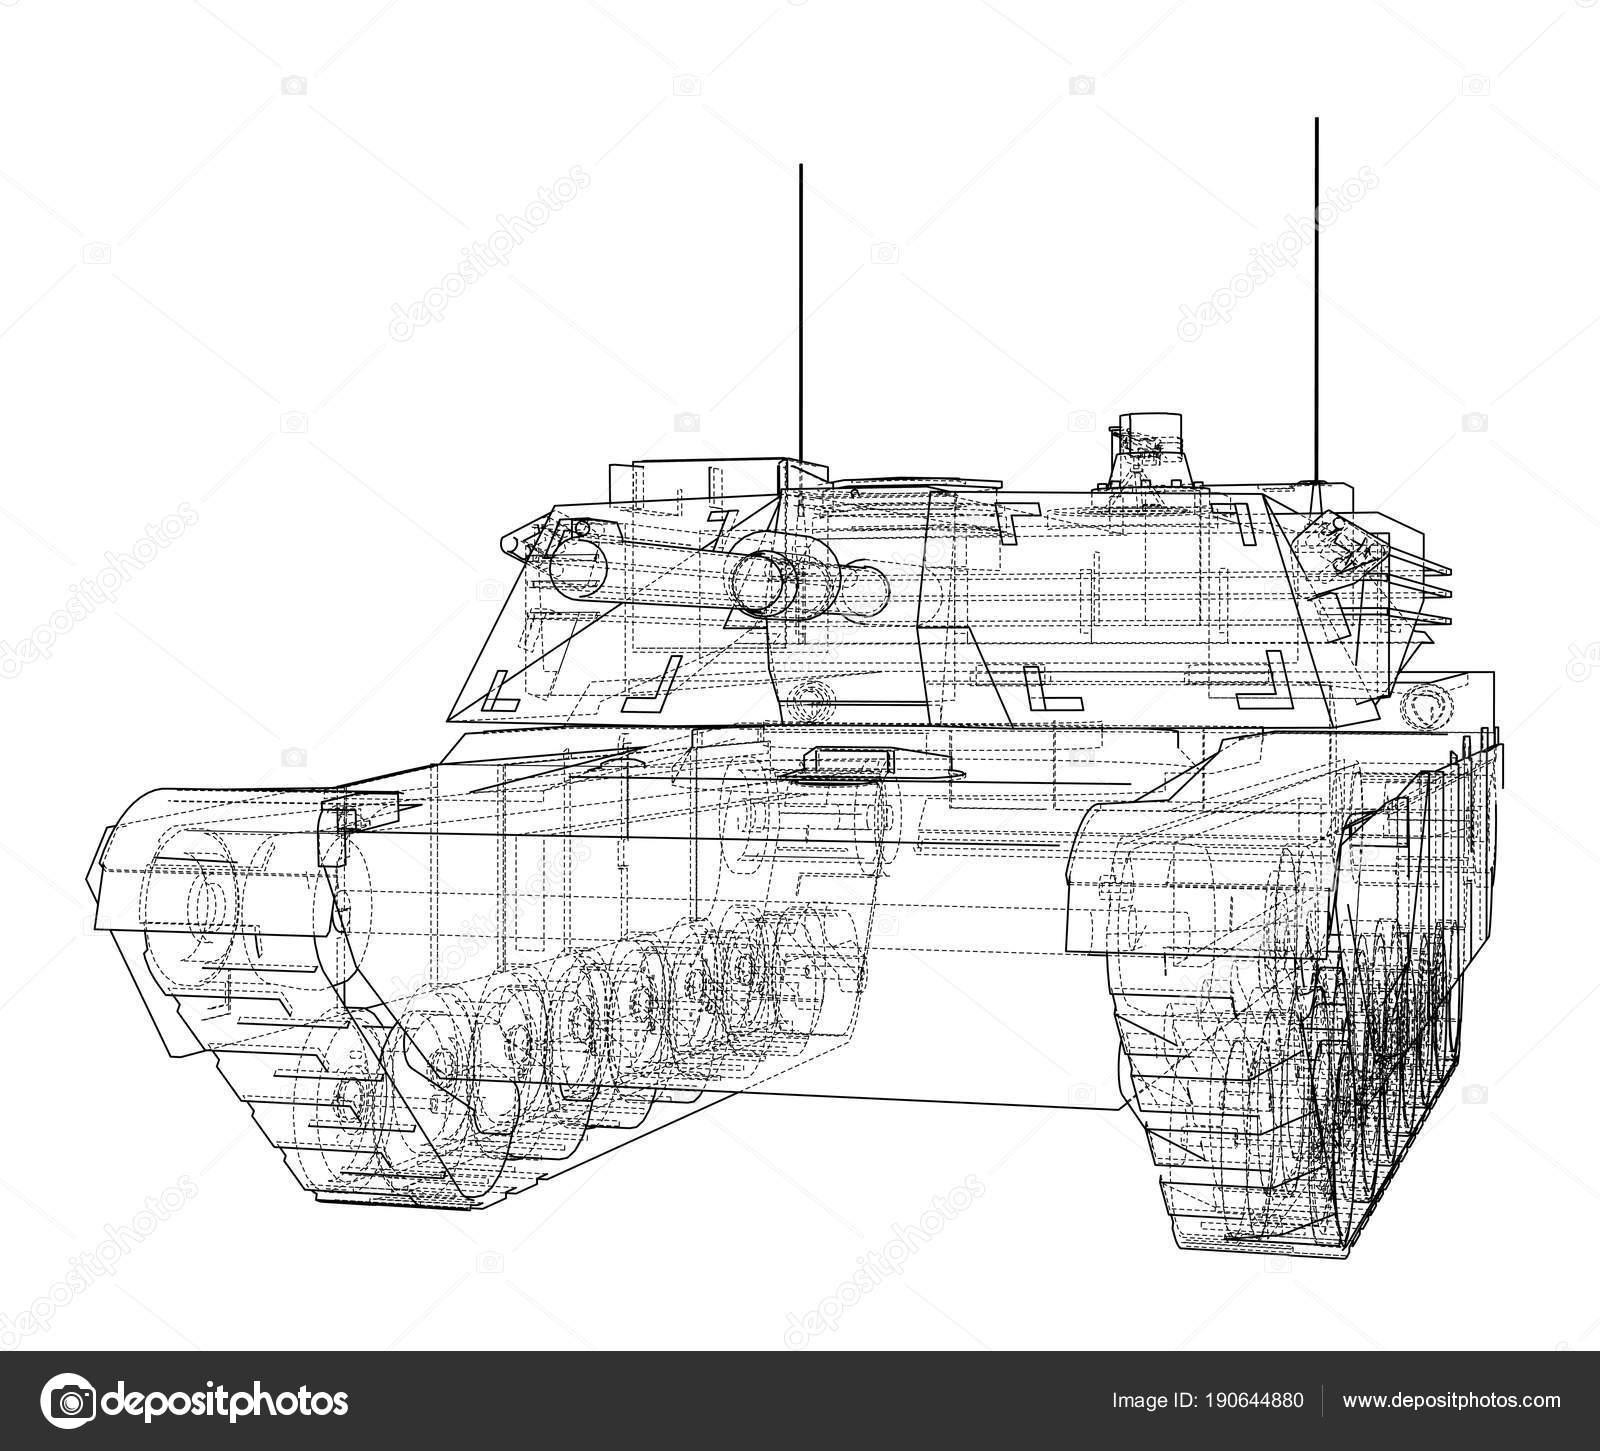 Blueprint of realistic tank stock photo cherezoff 190644880 blueprint or sketch of realistic tank 3d illustration photo by cherezoff malvernweather Choice Image